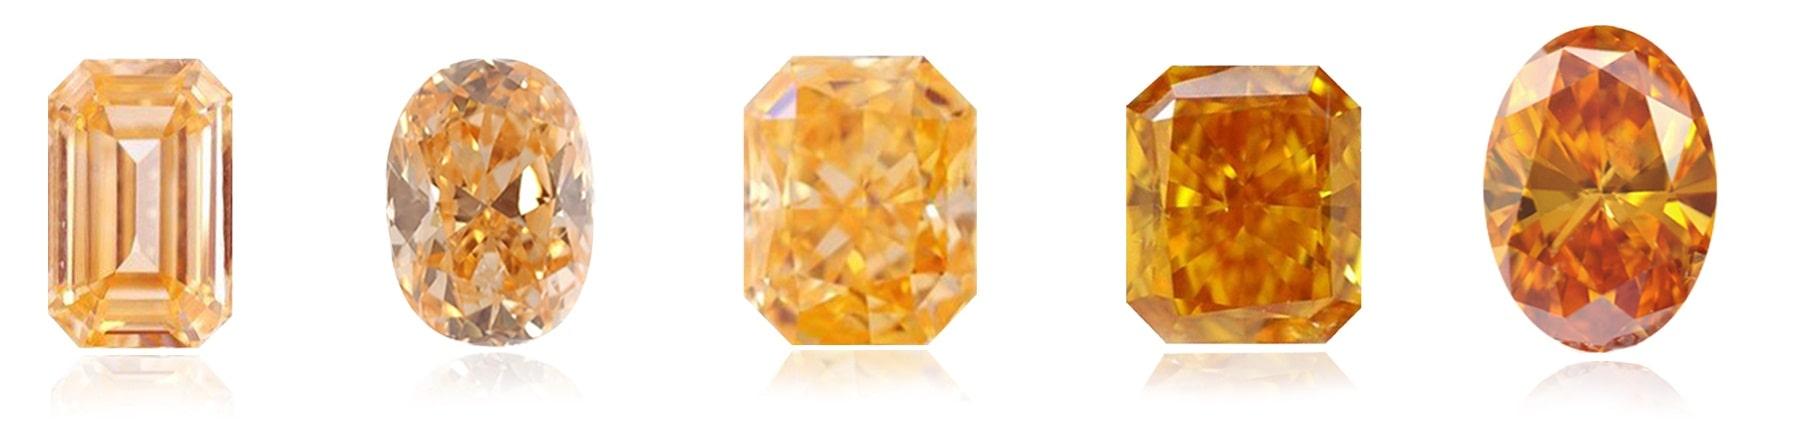 Orange Diamond Color Scale